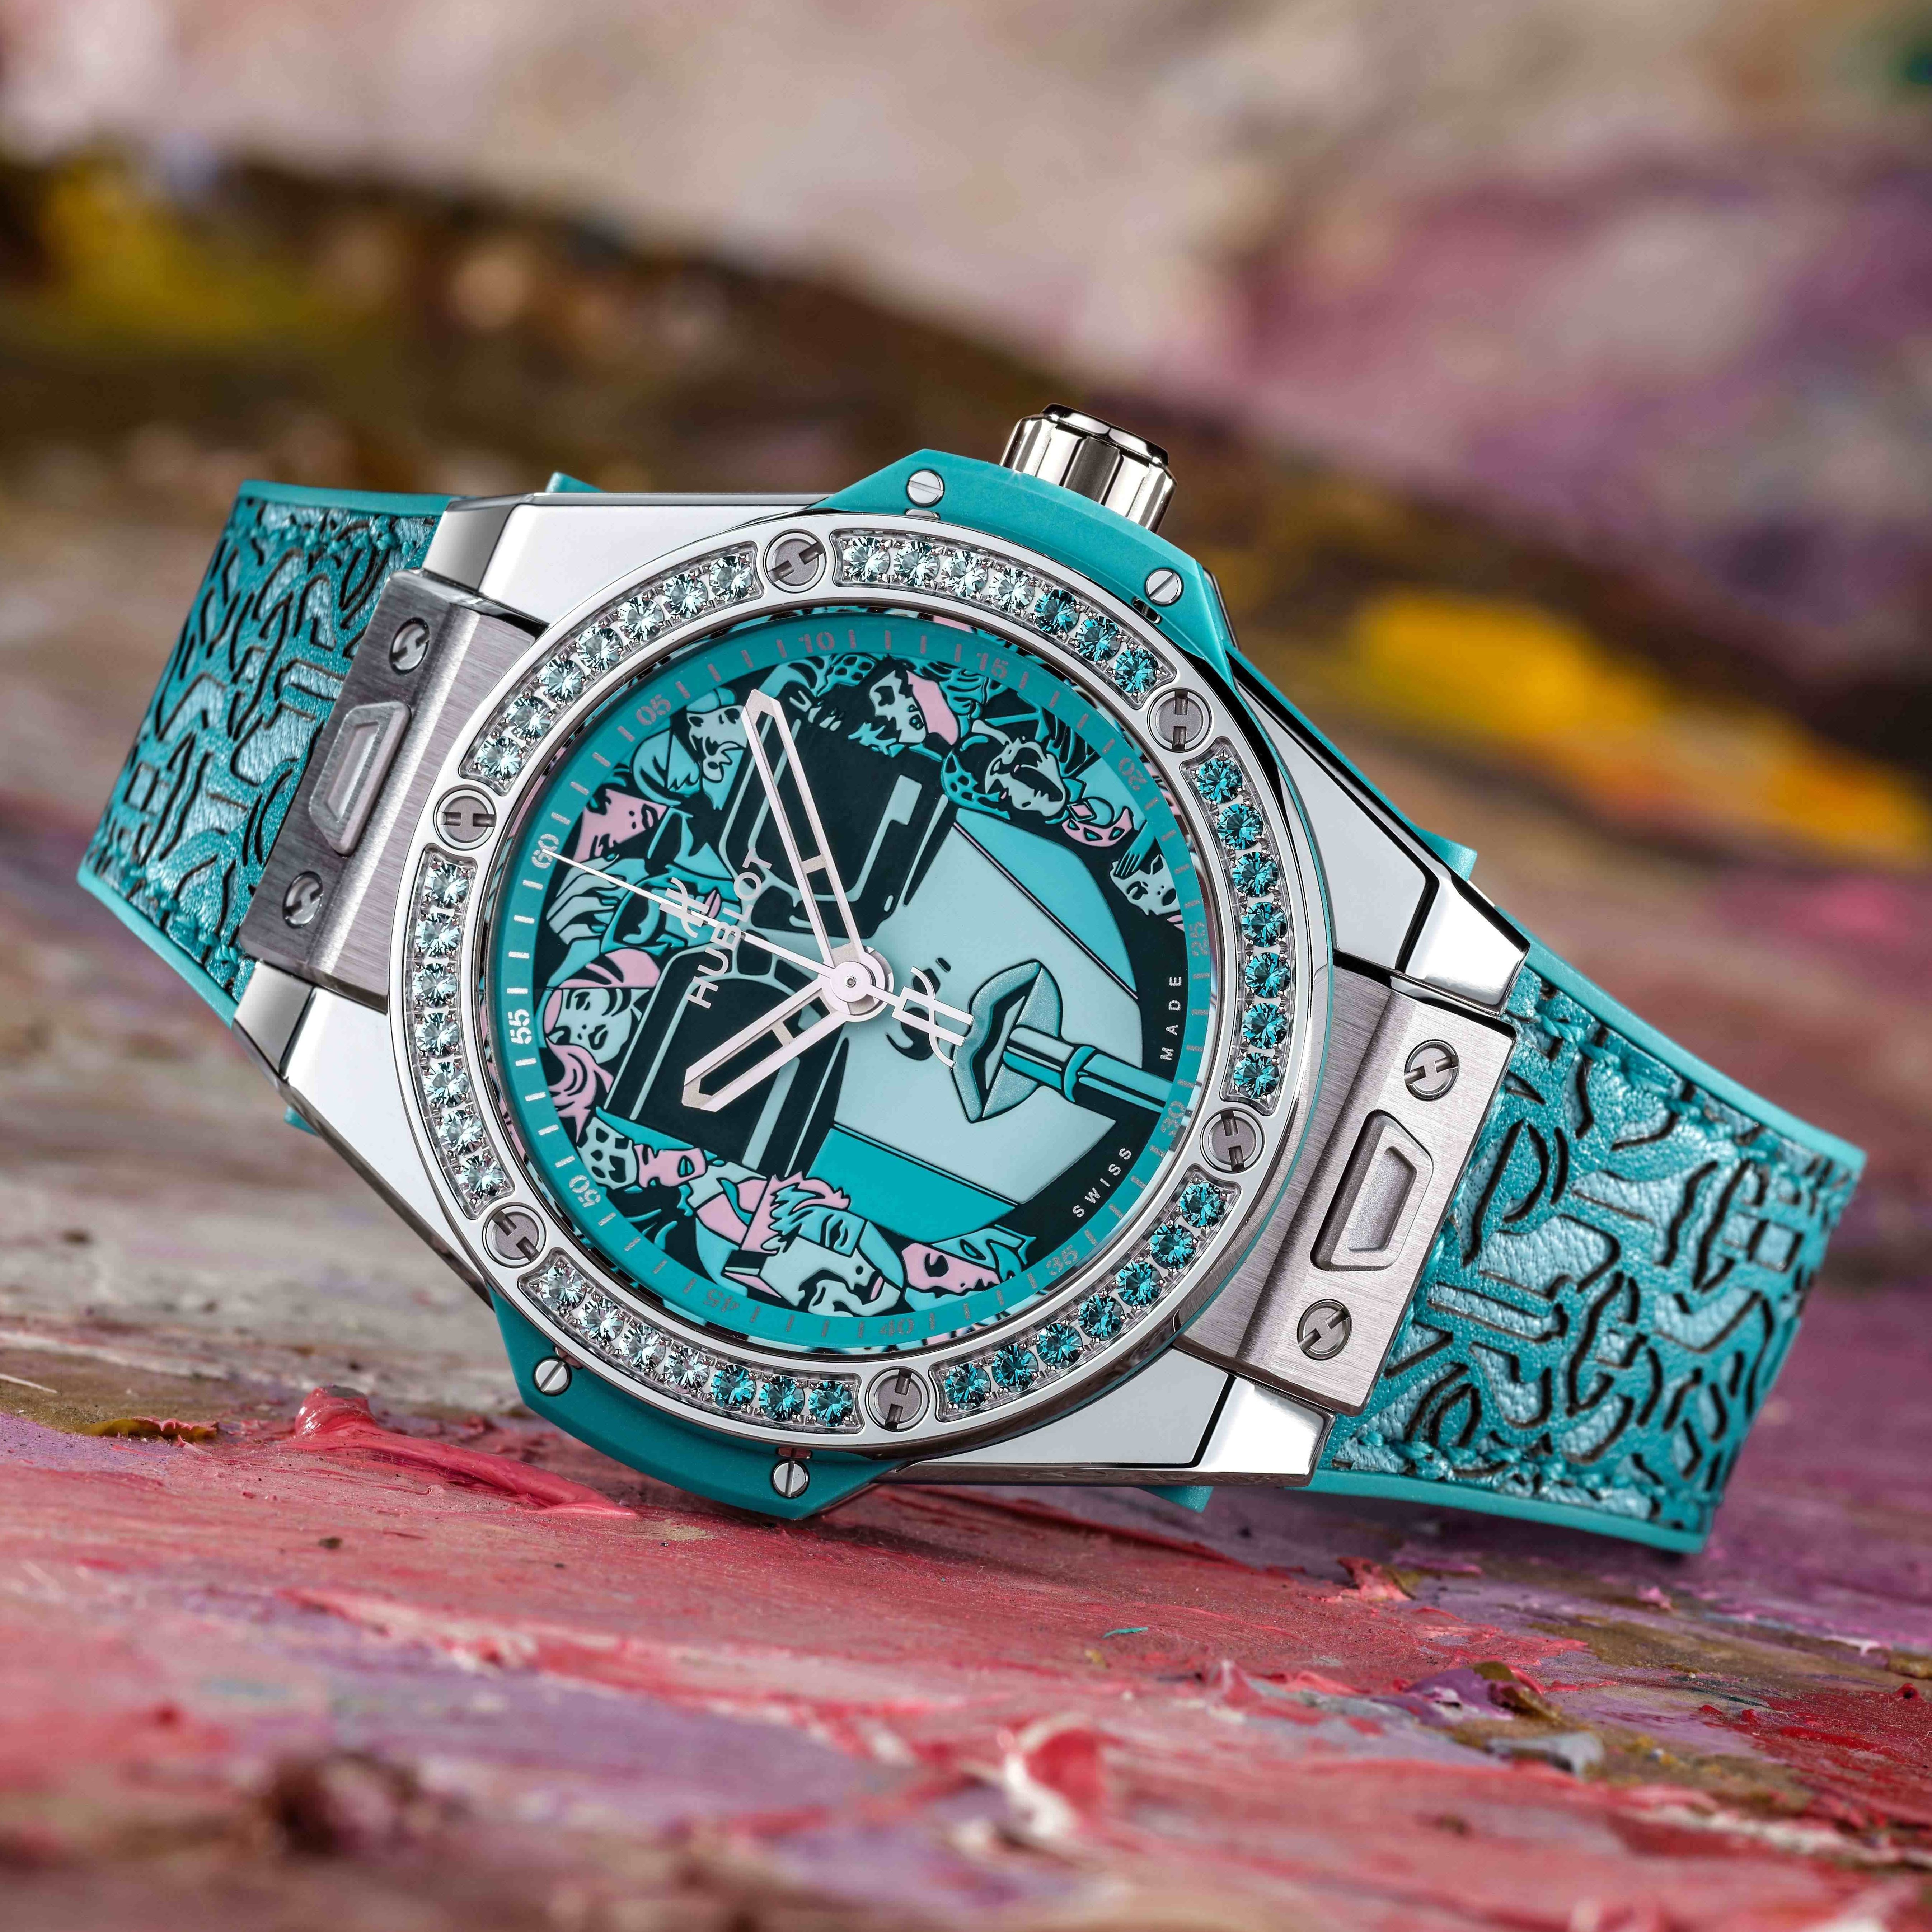 Hublot Big Bang One Click Marc Ferrero Steel Turquoise